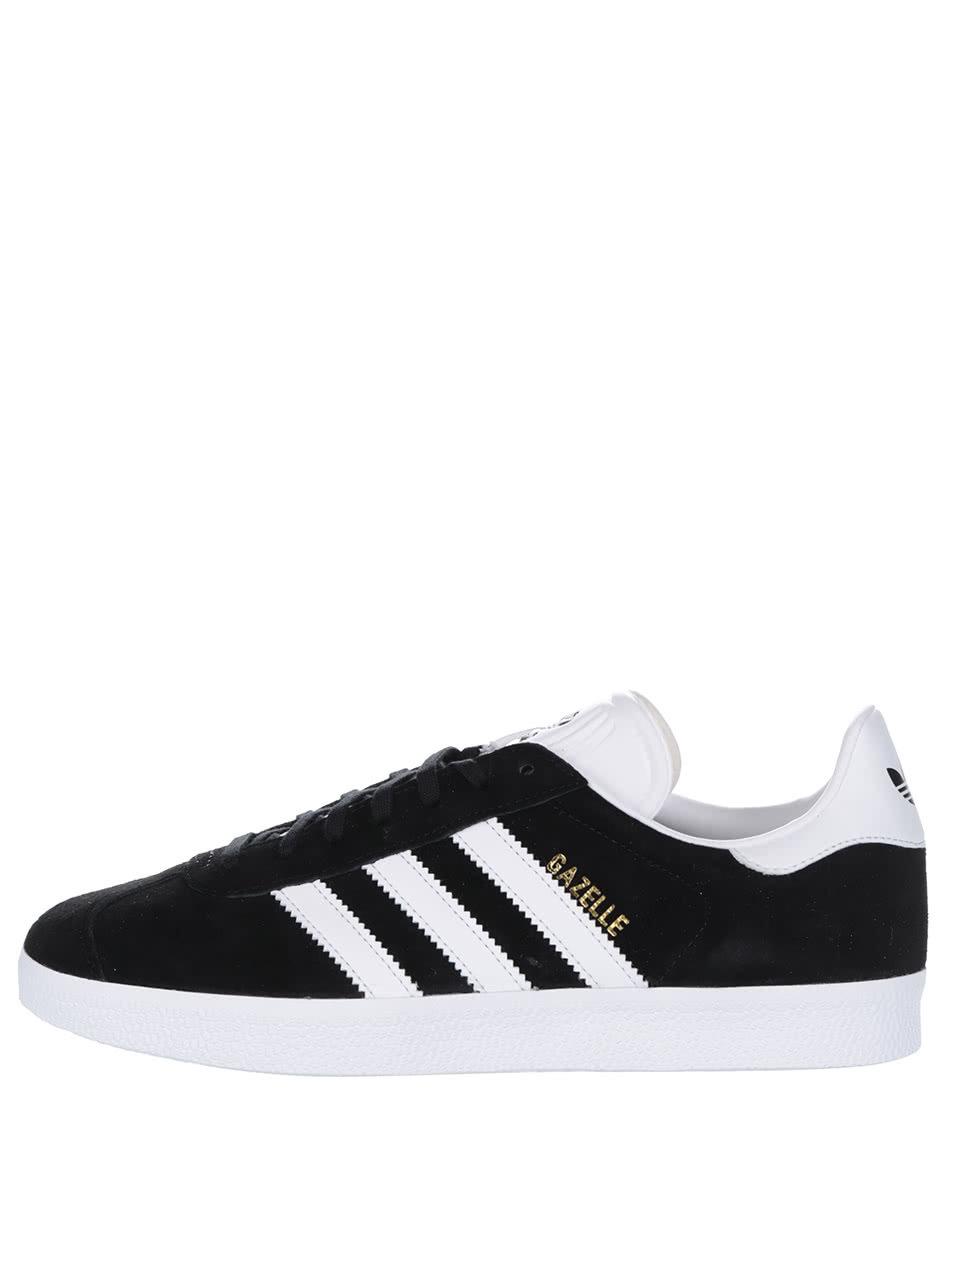 cc340e28016 Černé pánské semišové tenisky adidas Originals Gazelle ...